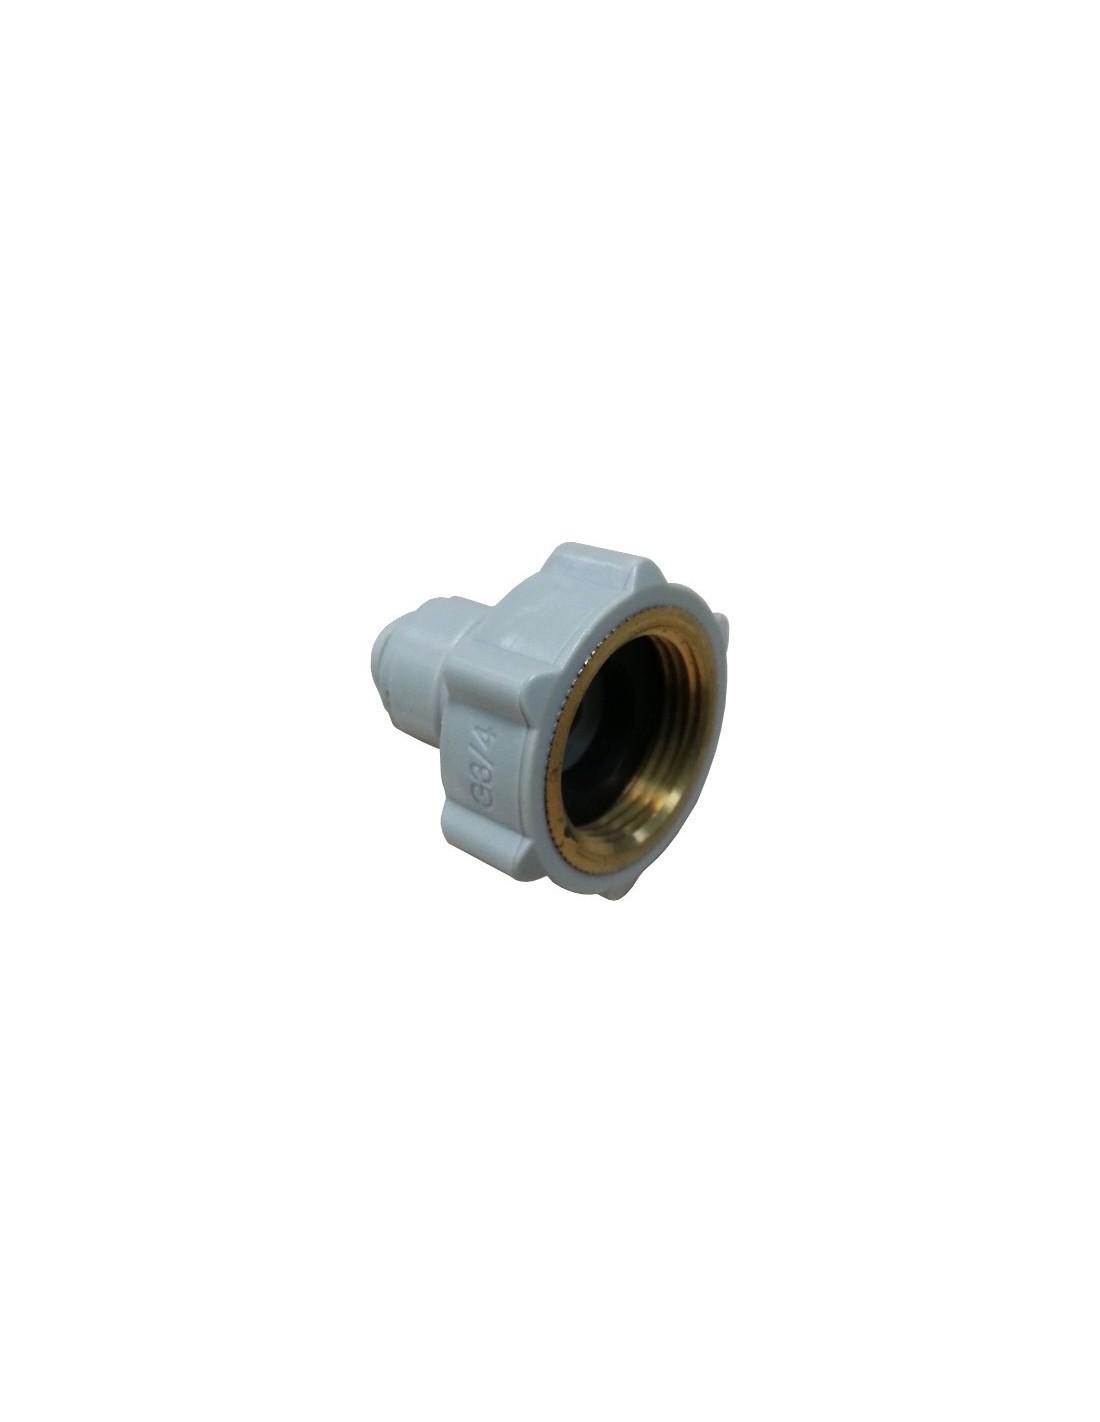 HCF-NH-I - FluidFit HCF-NH female adapter NH (3/4 thread in brass) (inch)